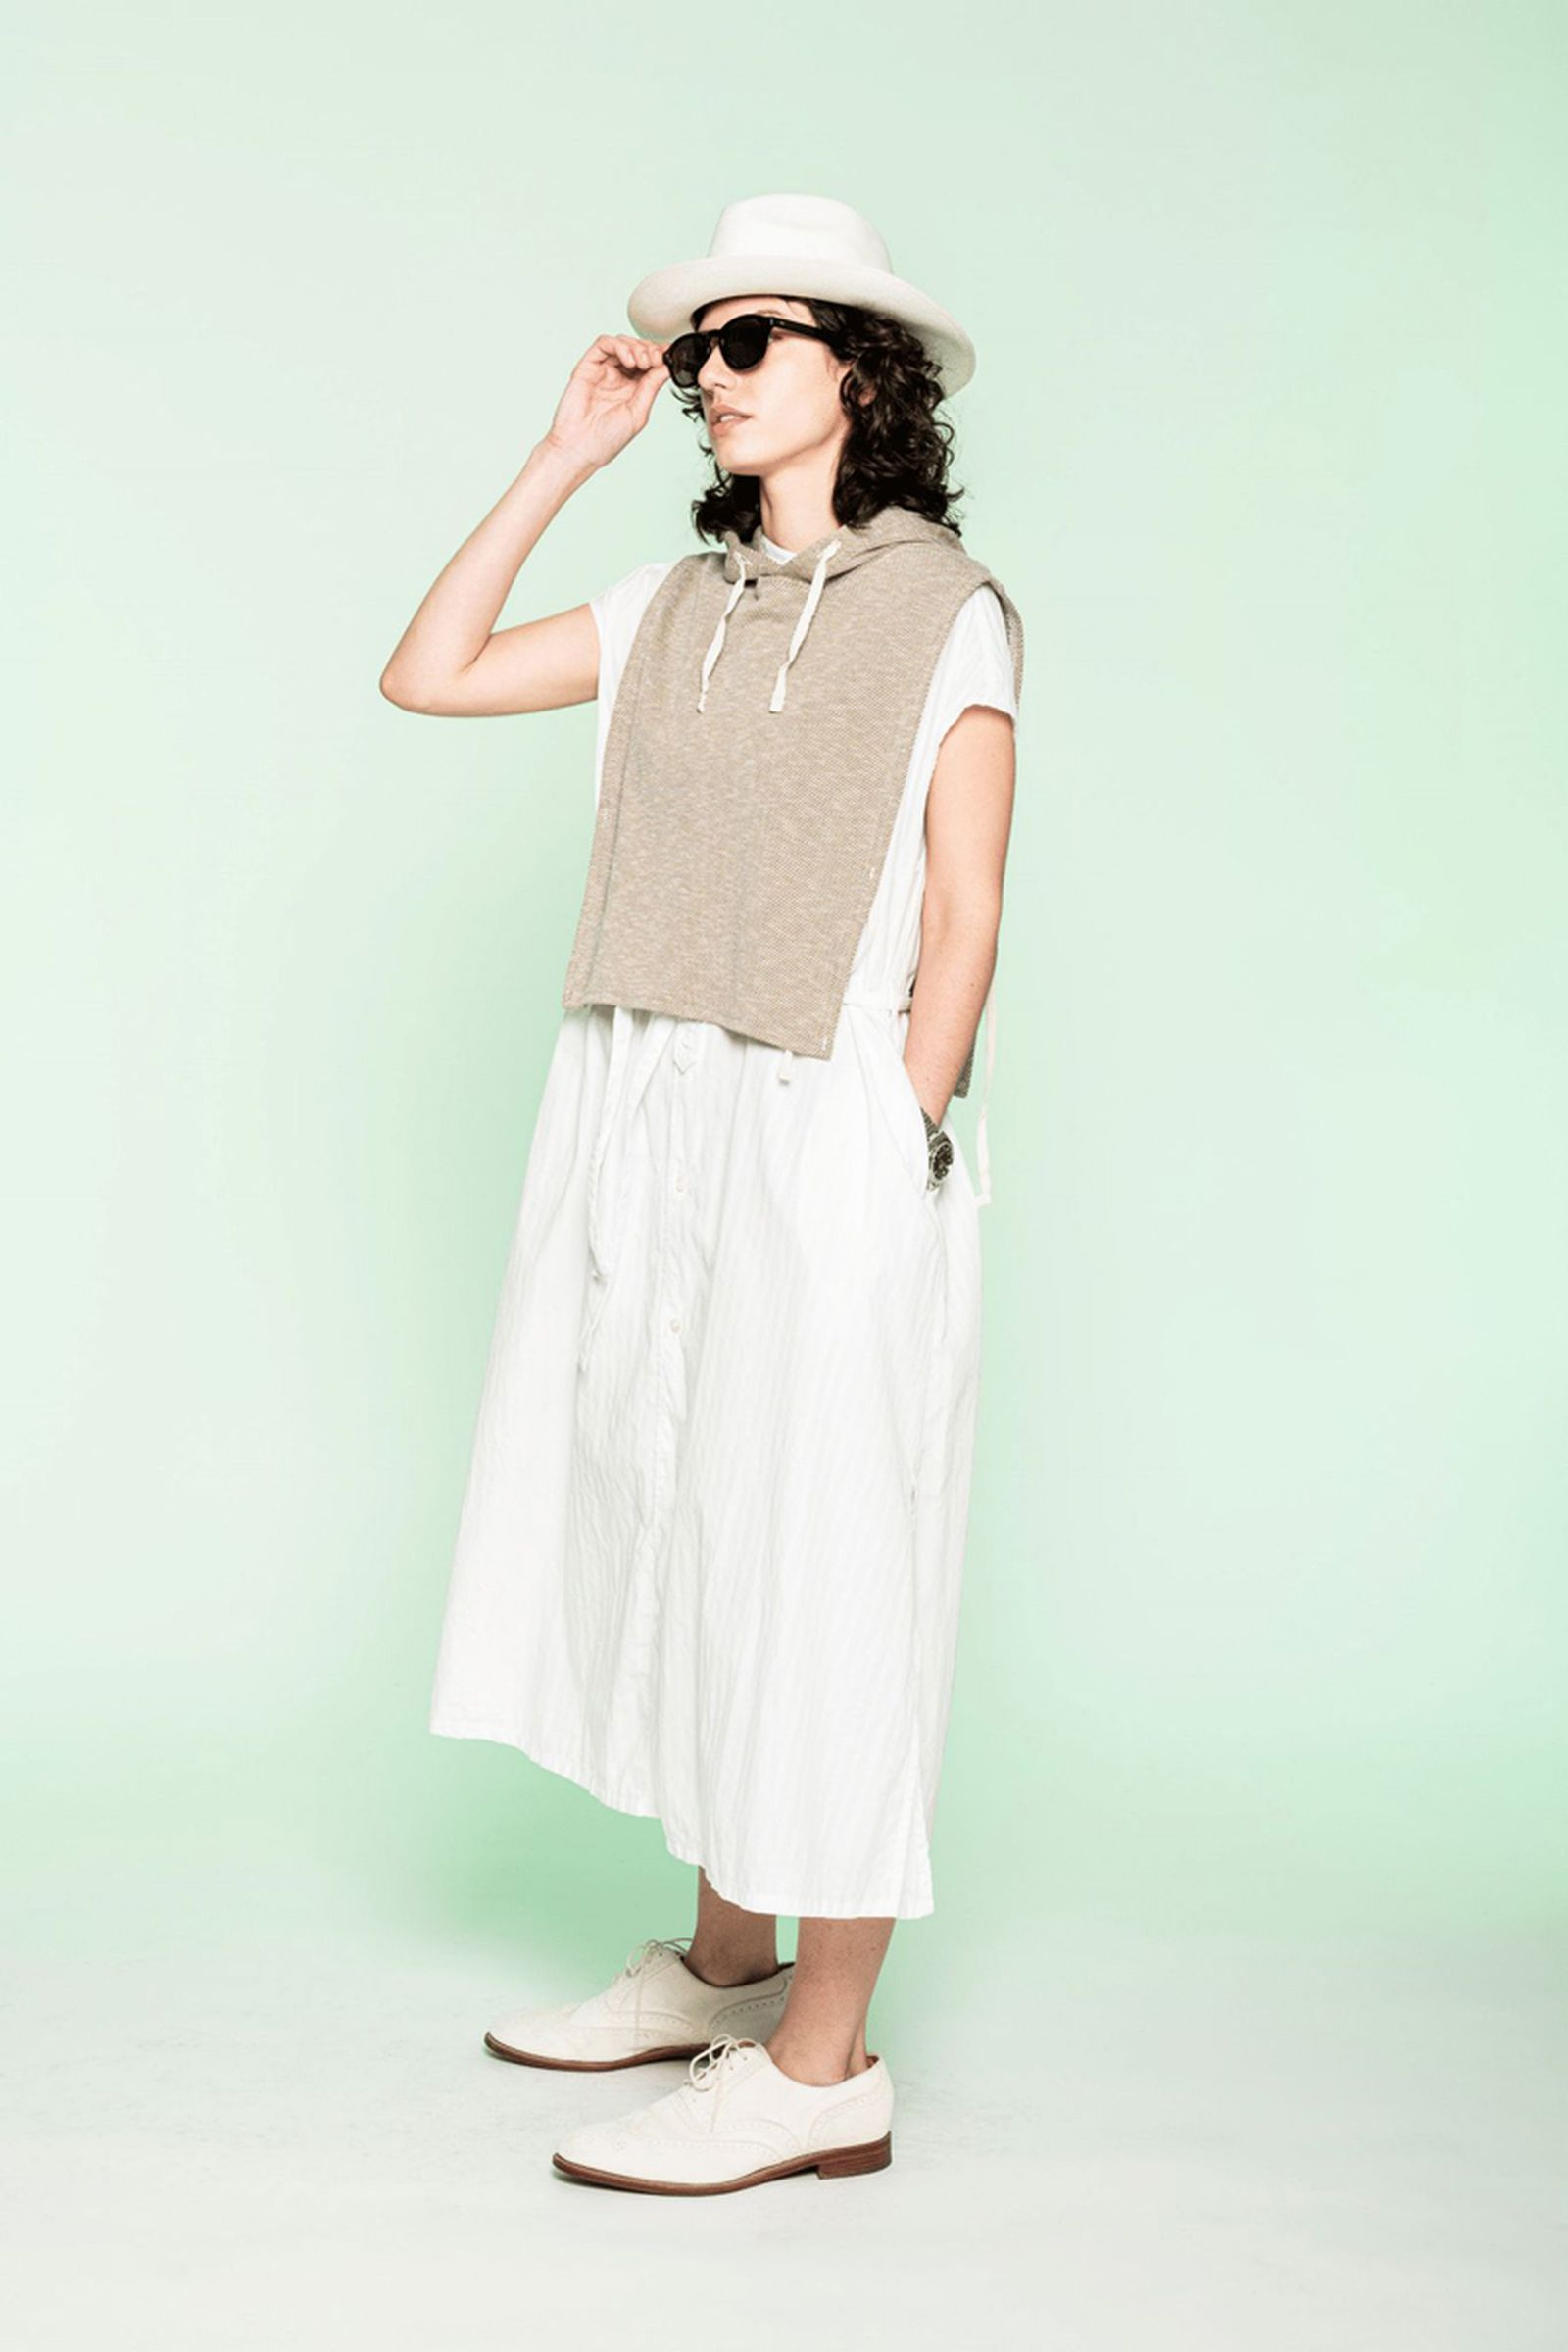 engineered garments spring summer 2022 collection lookbook (22)